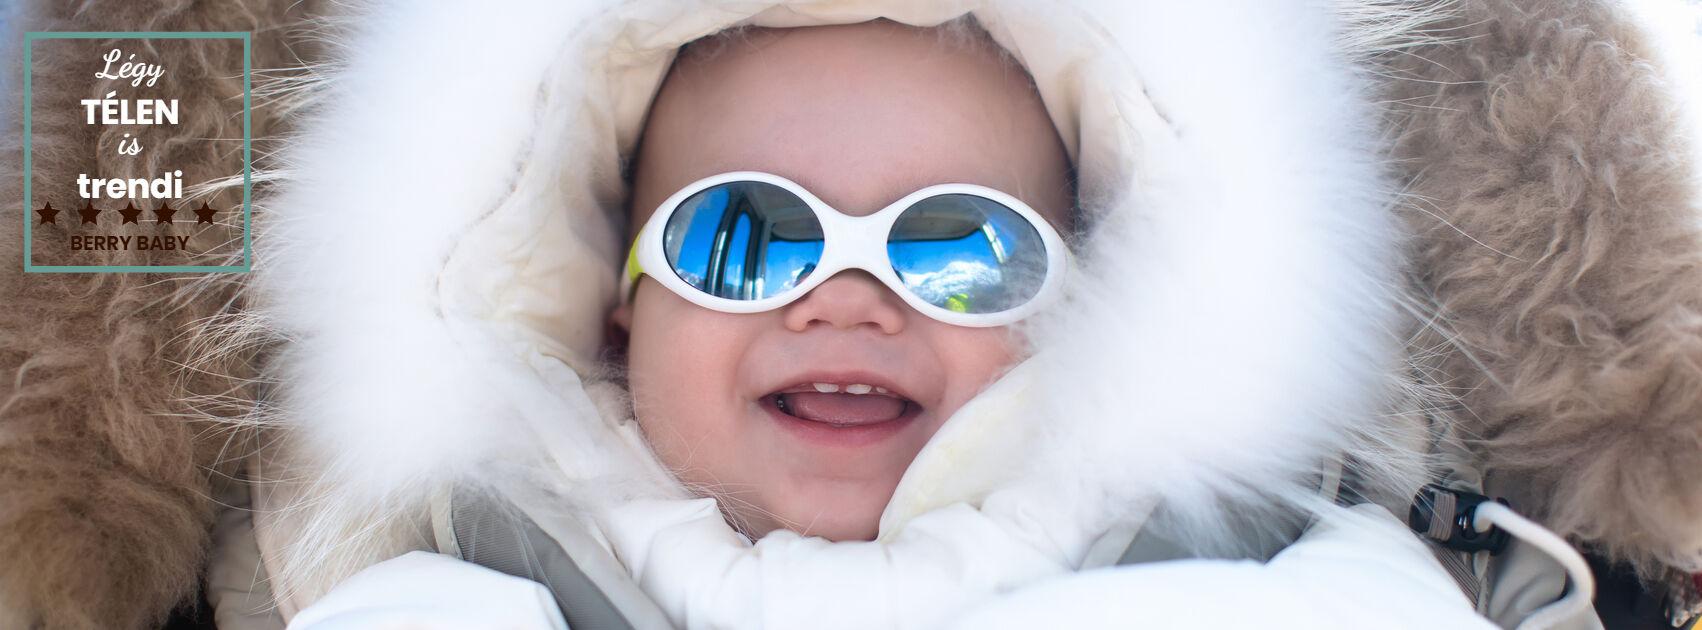 Légy trendi télen is a Berry Baby- vel